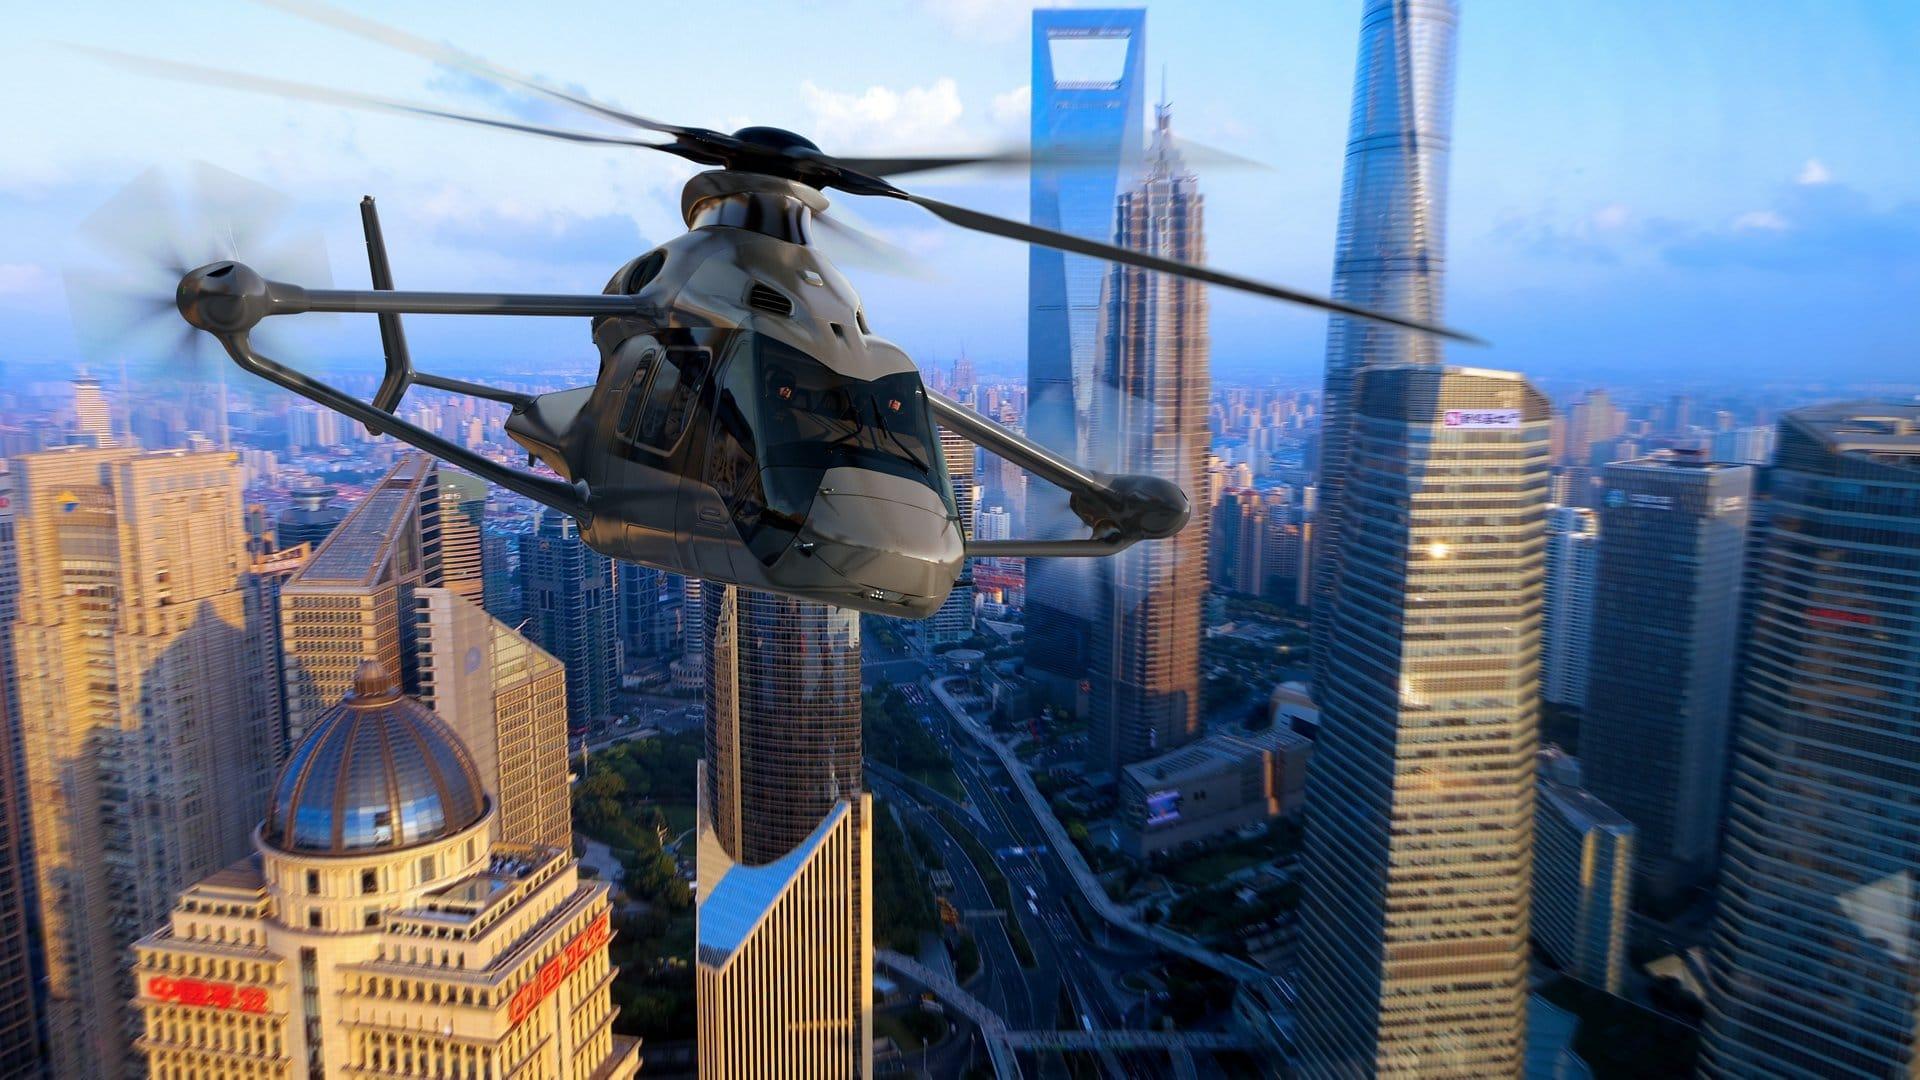 Racer nuovo elicottero Airbus Credits: Airbus